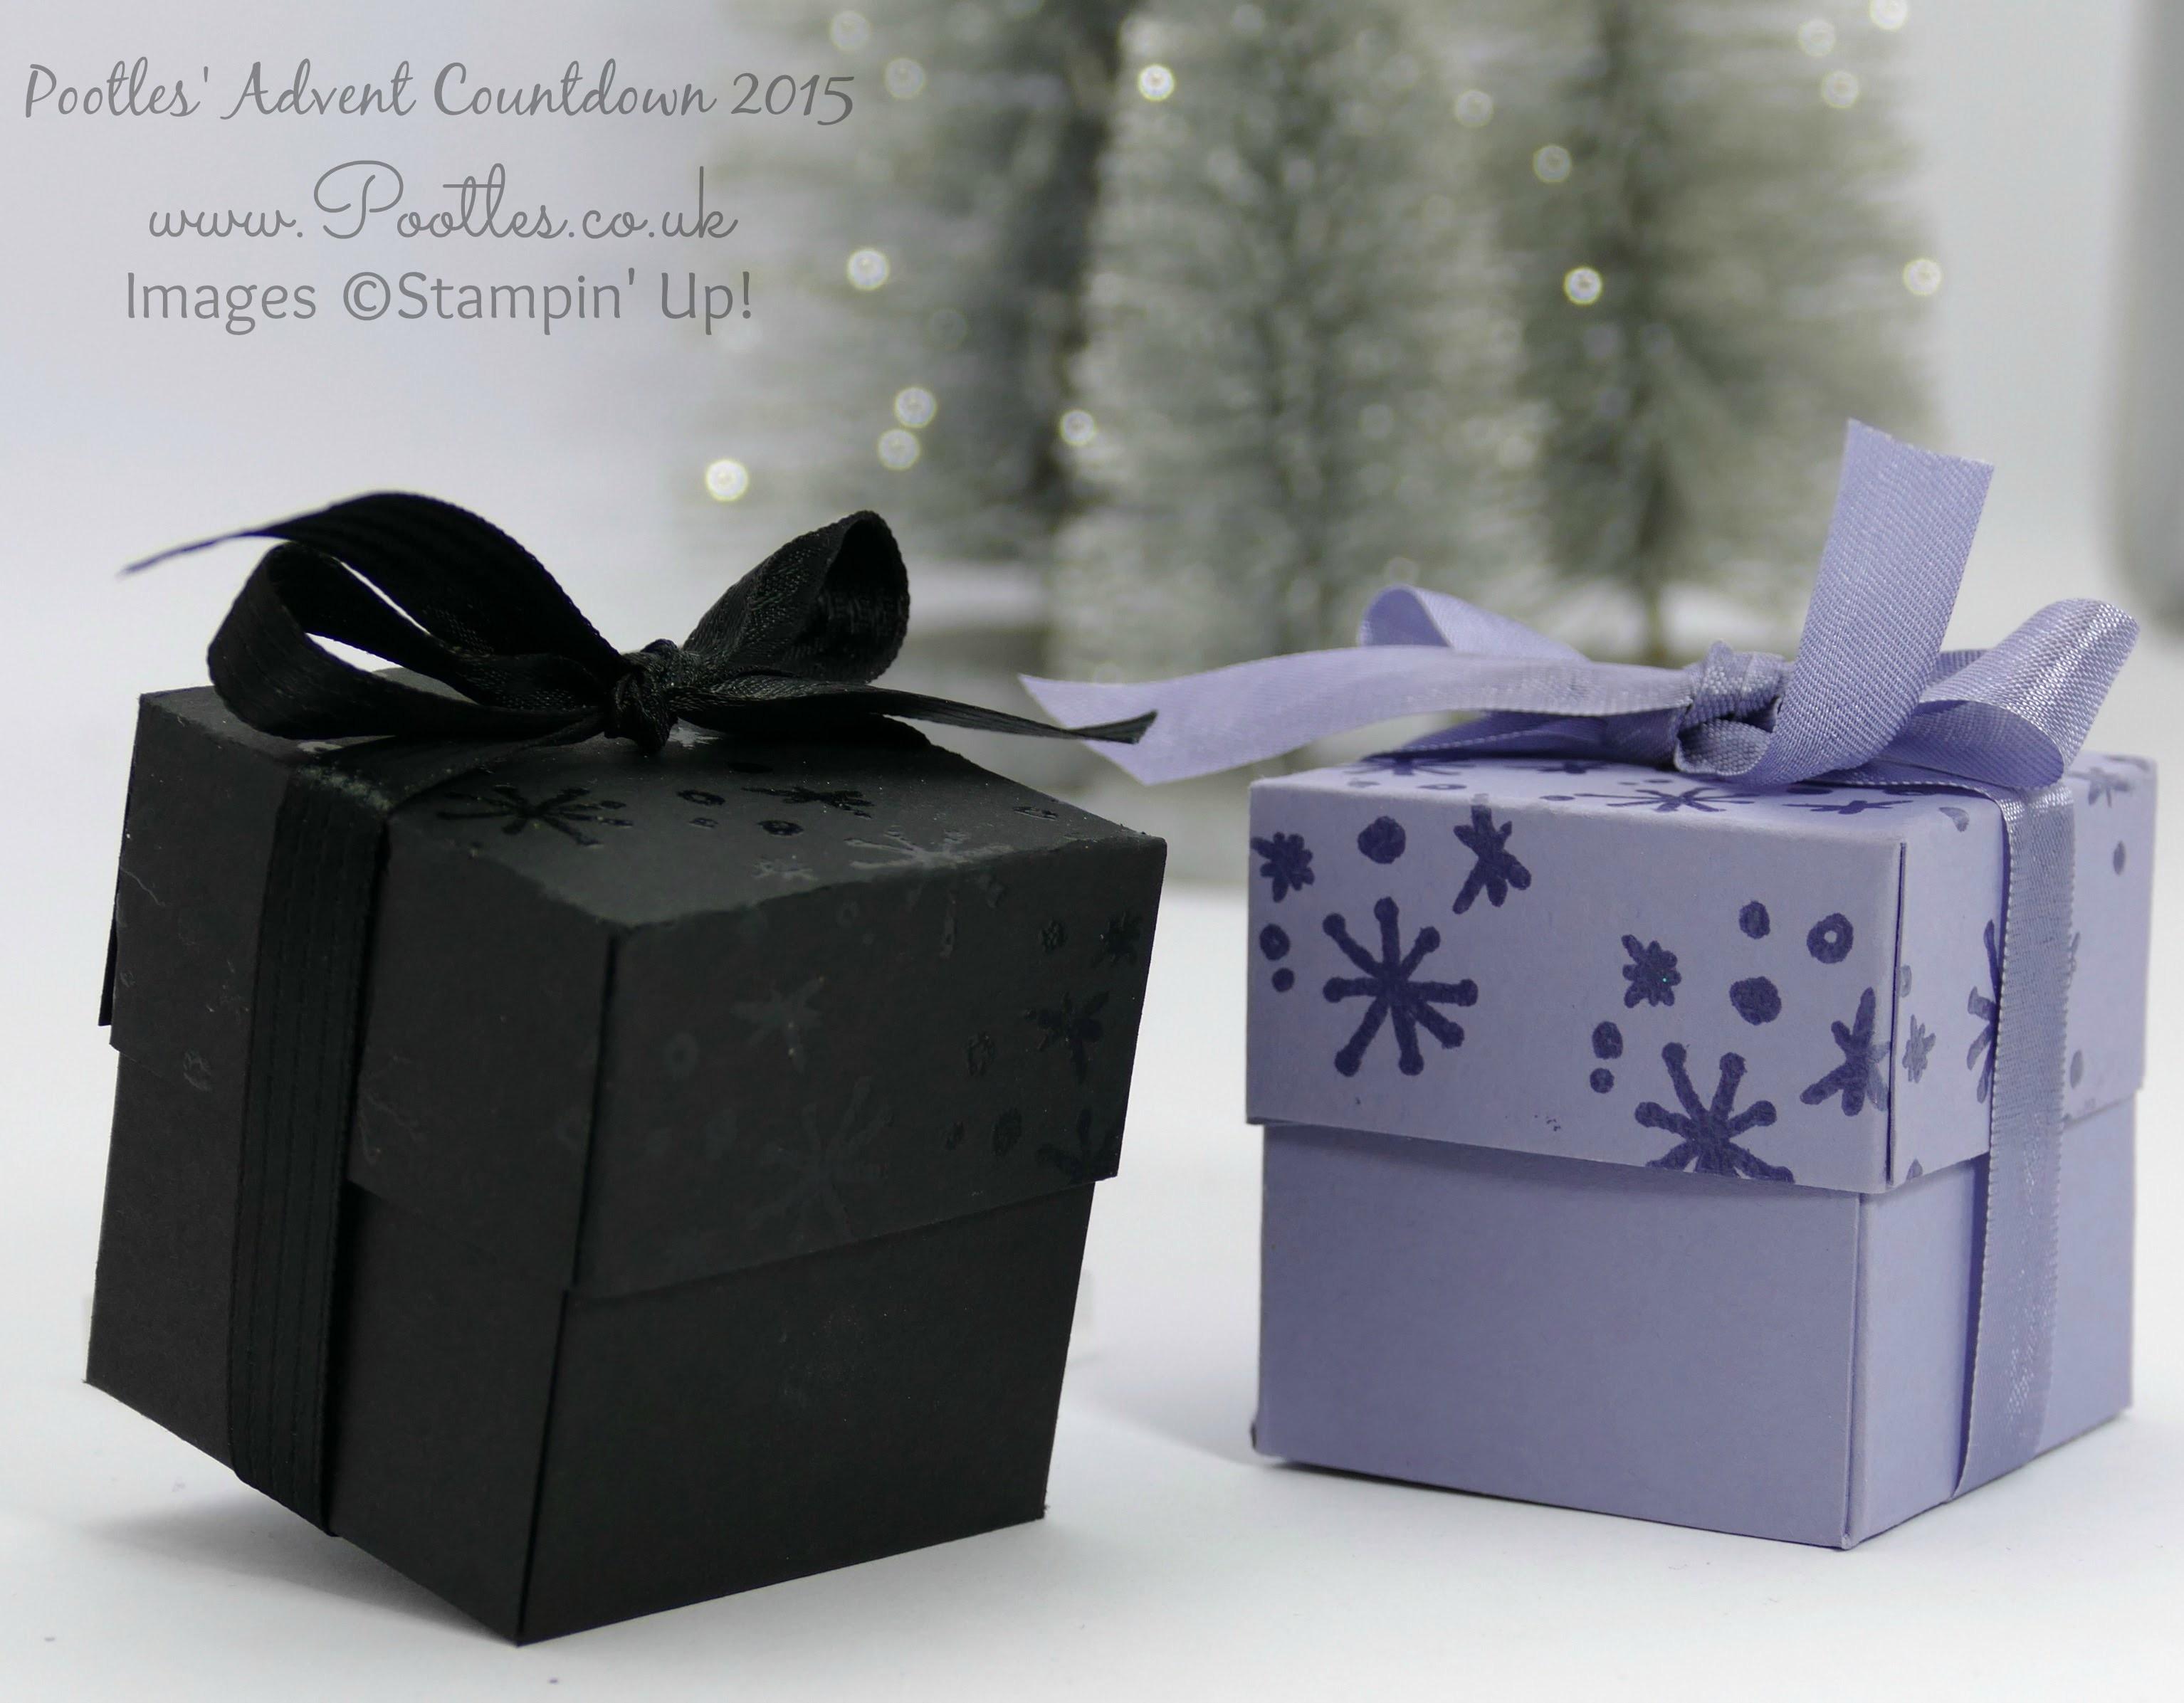 Pootles Advent Countdown #12 Heat Embossed Pretty Box Tutorial